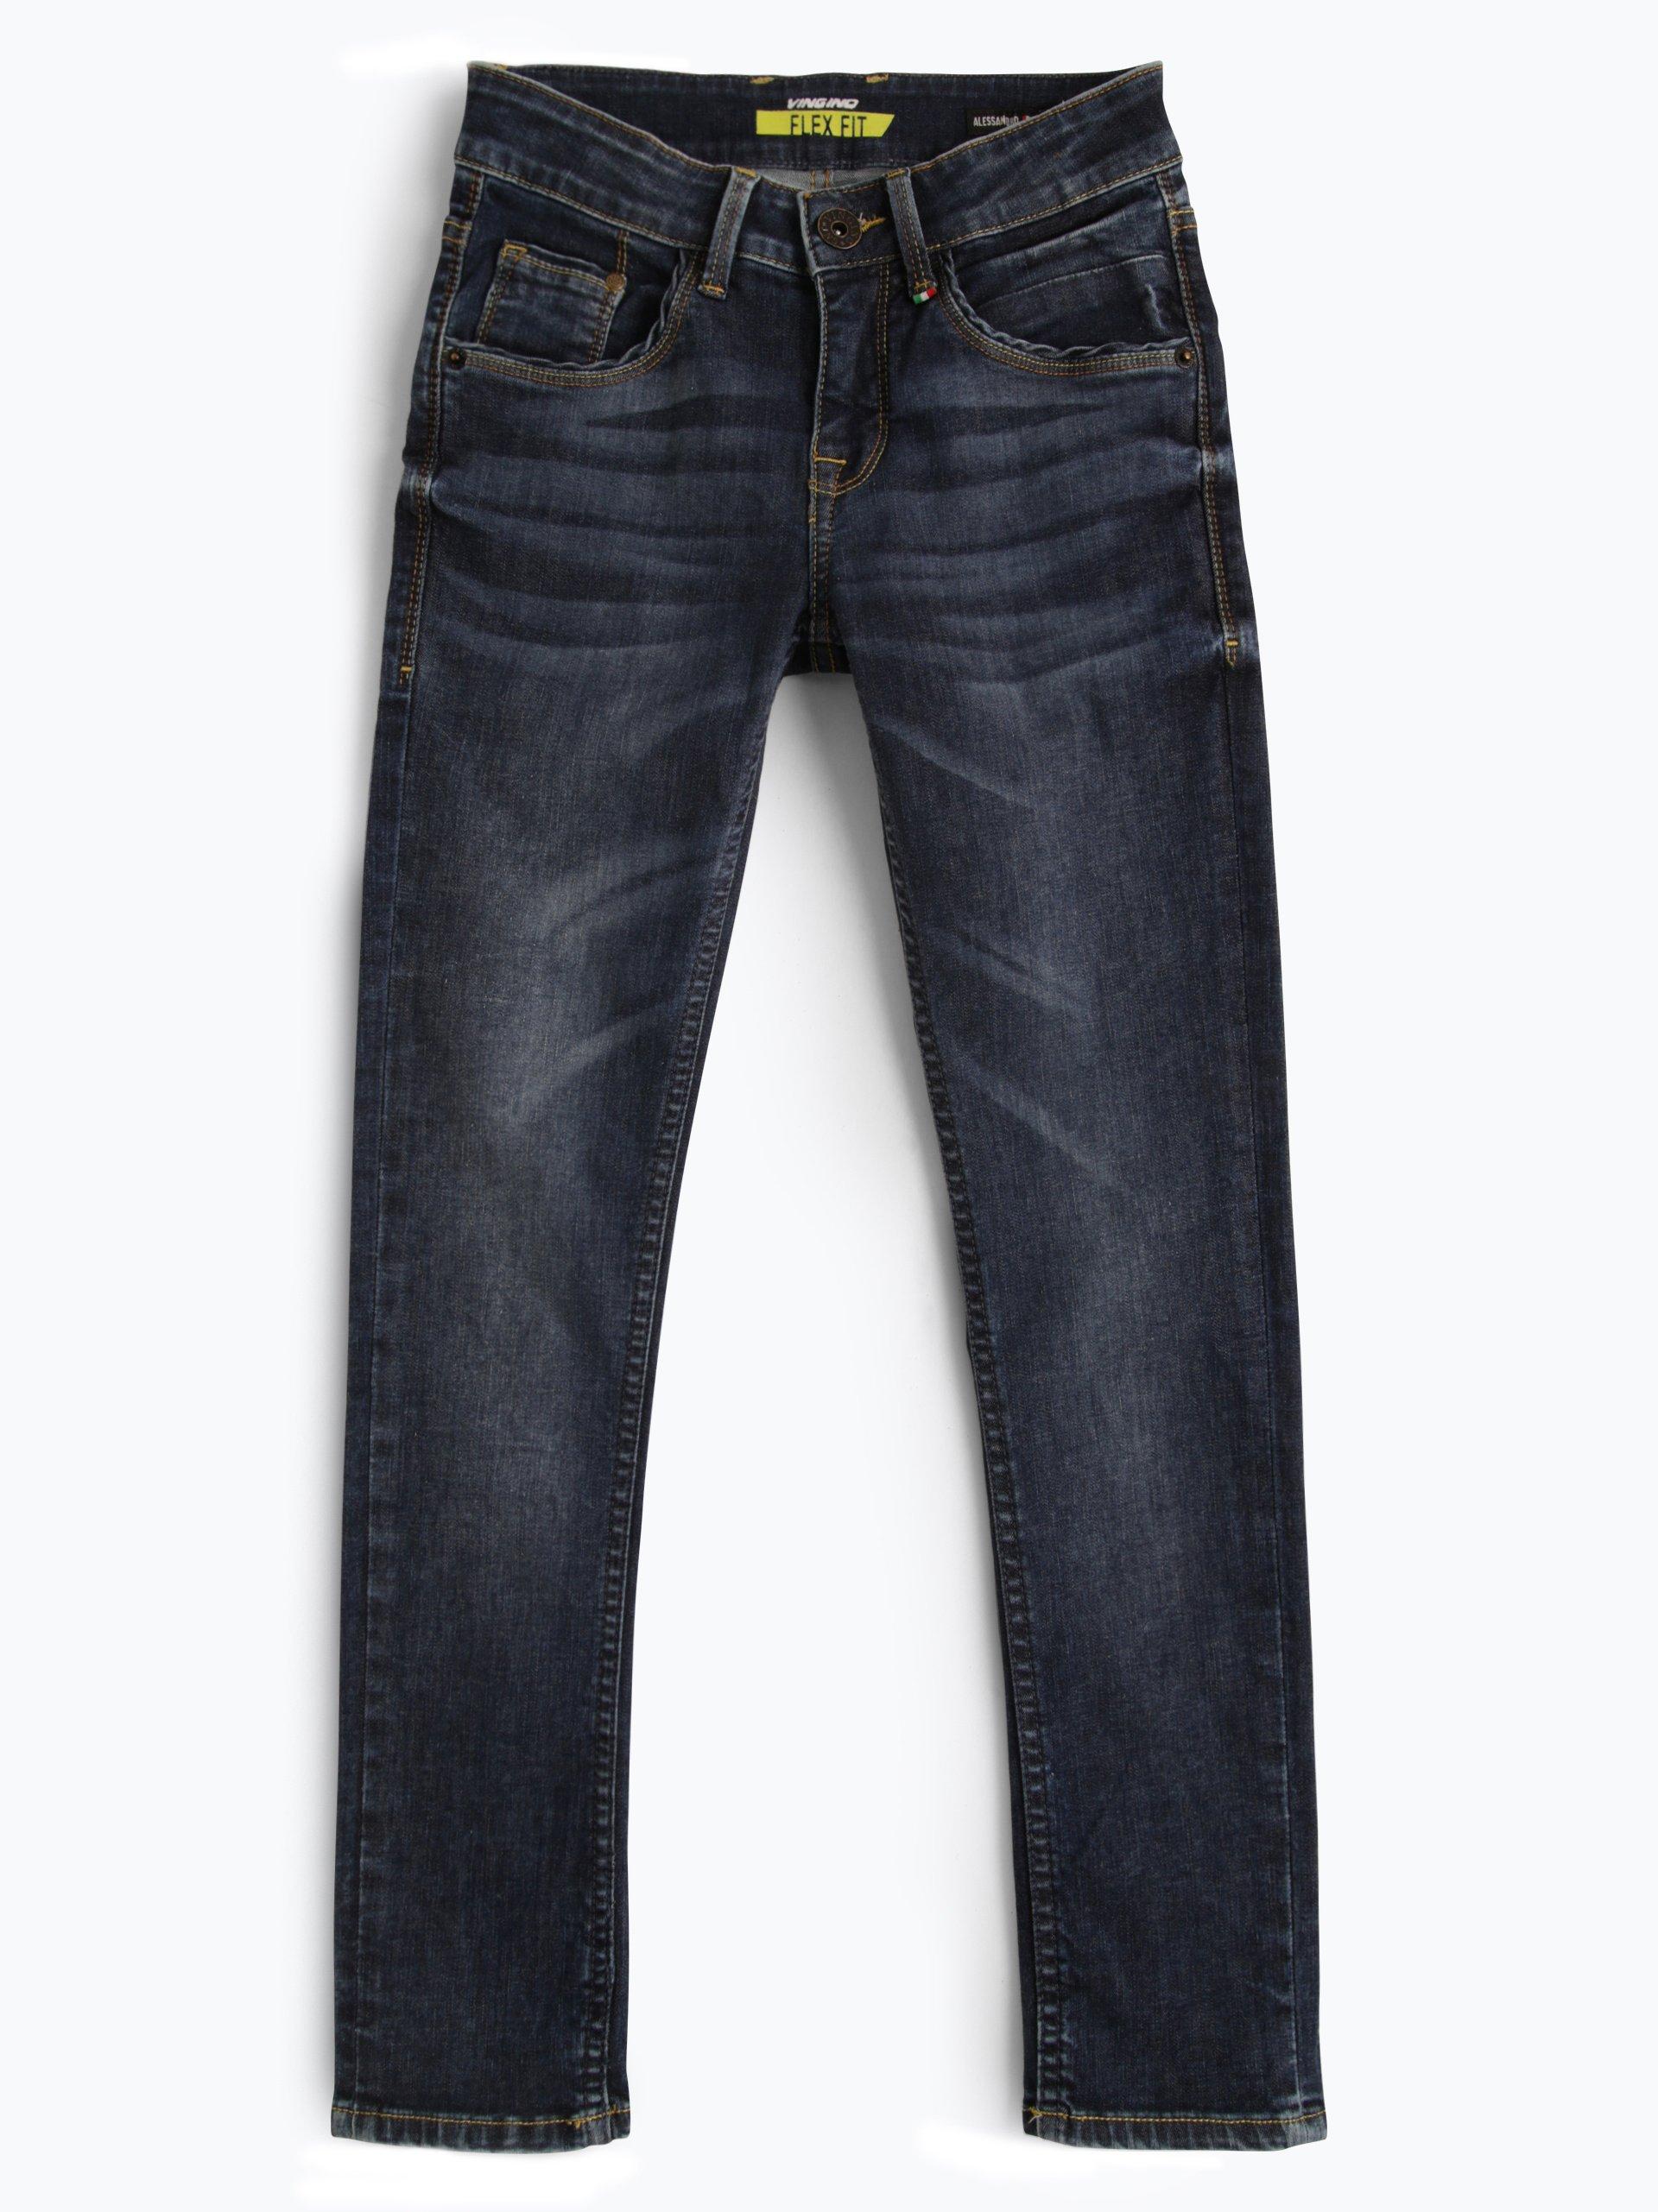 vingino jungen jeans skinny fit alessandro 2 online kaufen peek und cloppenburg de. Black Bedroom Furniture Sets. Home Design Ideas